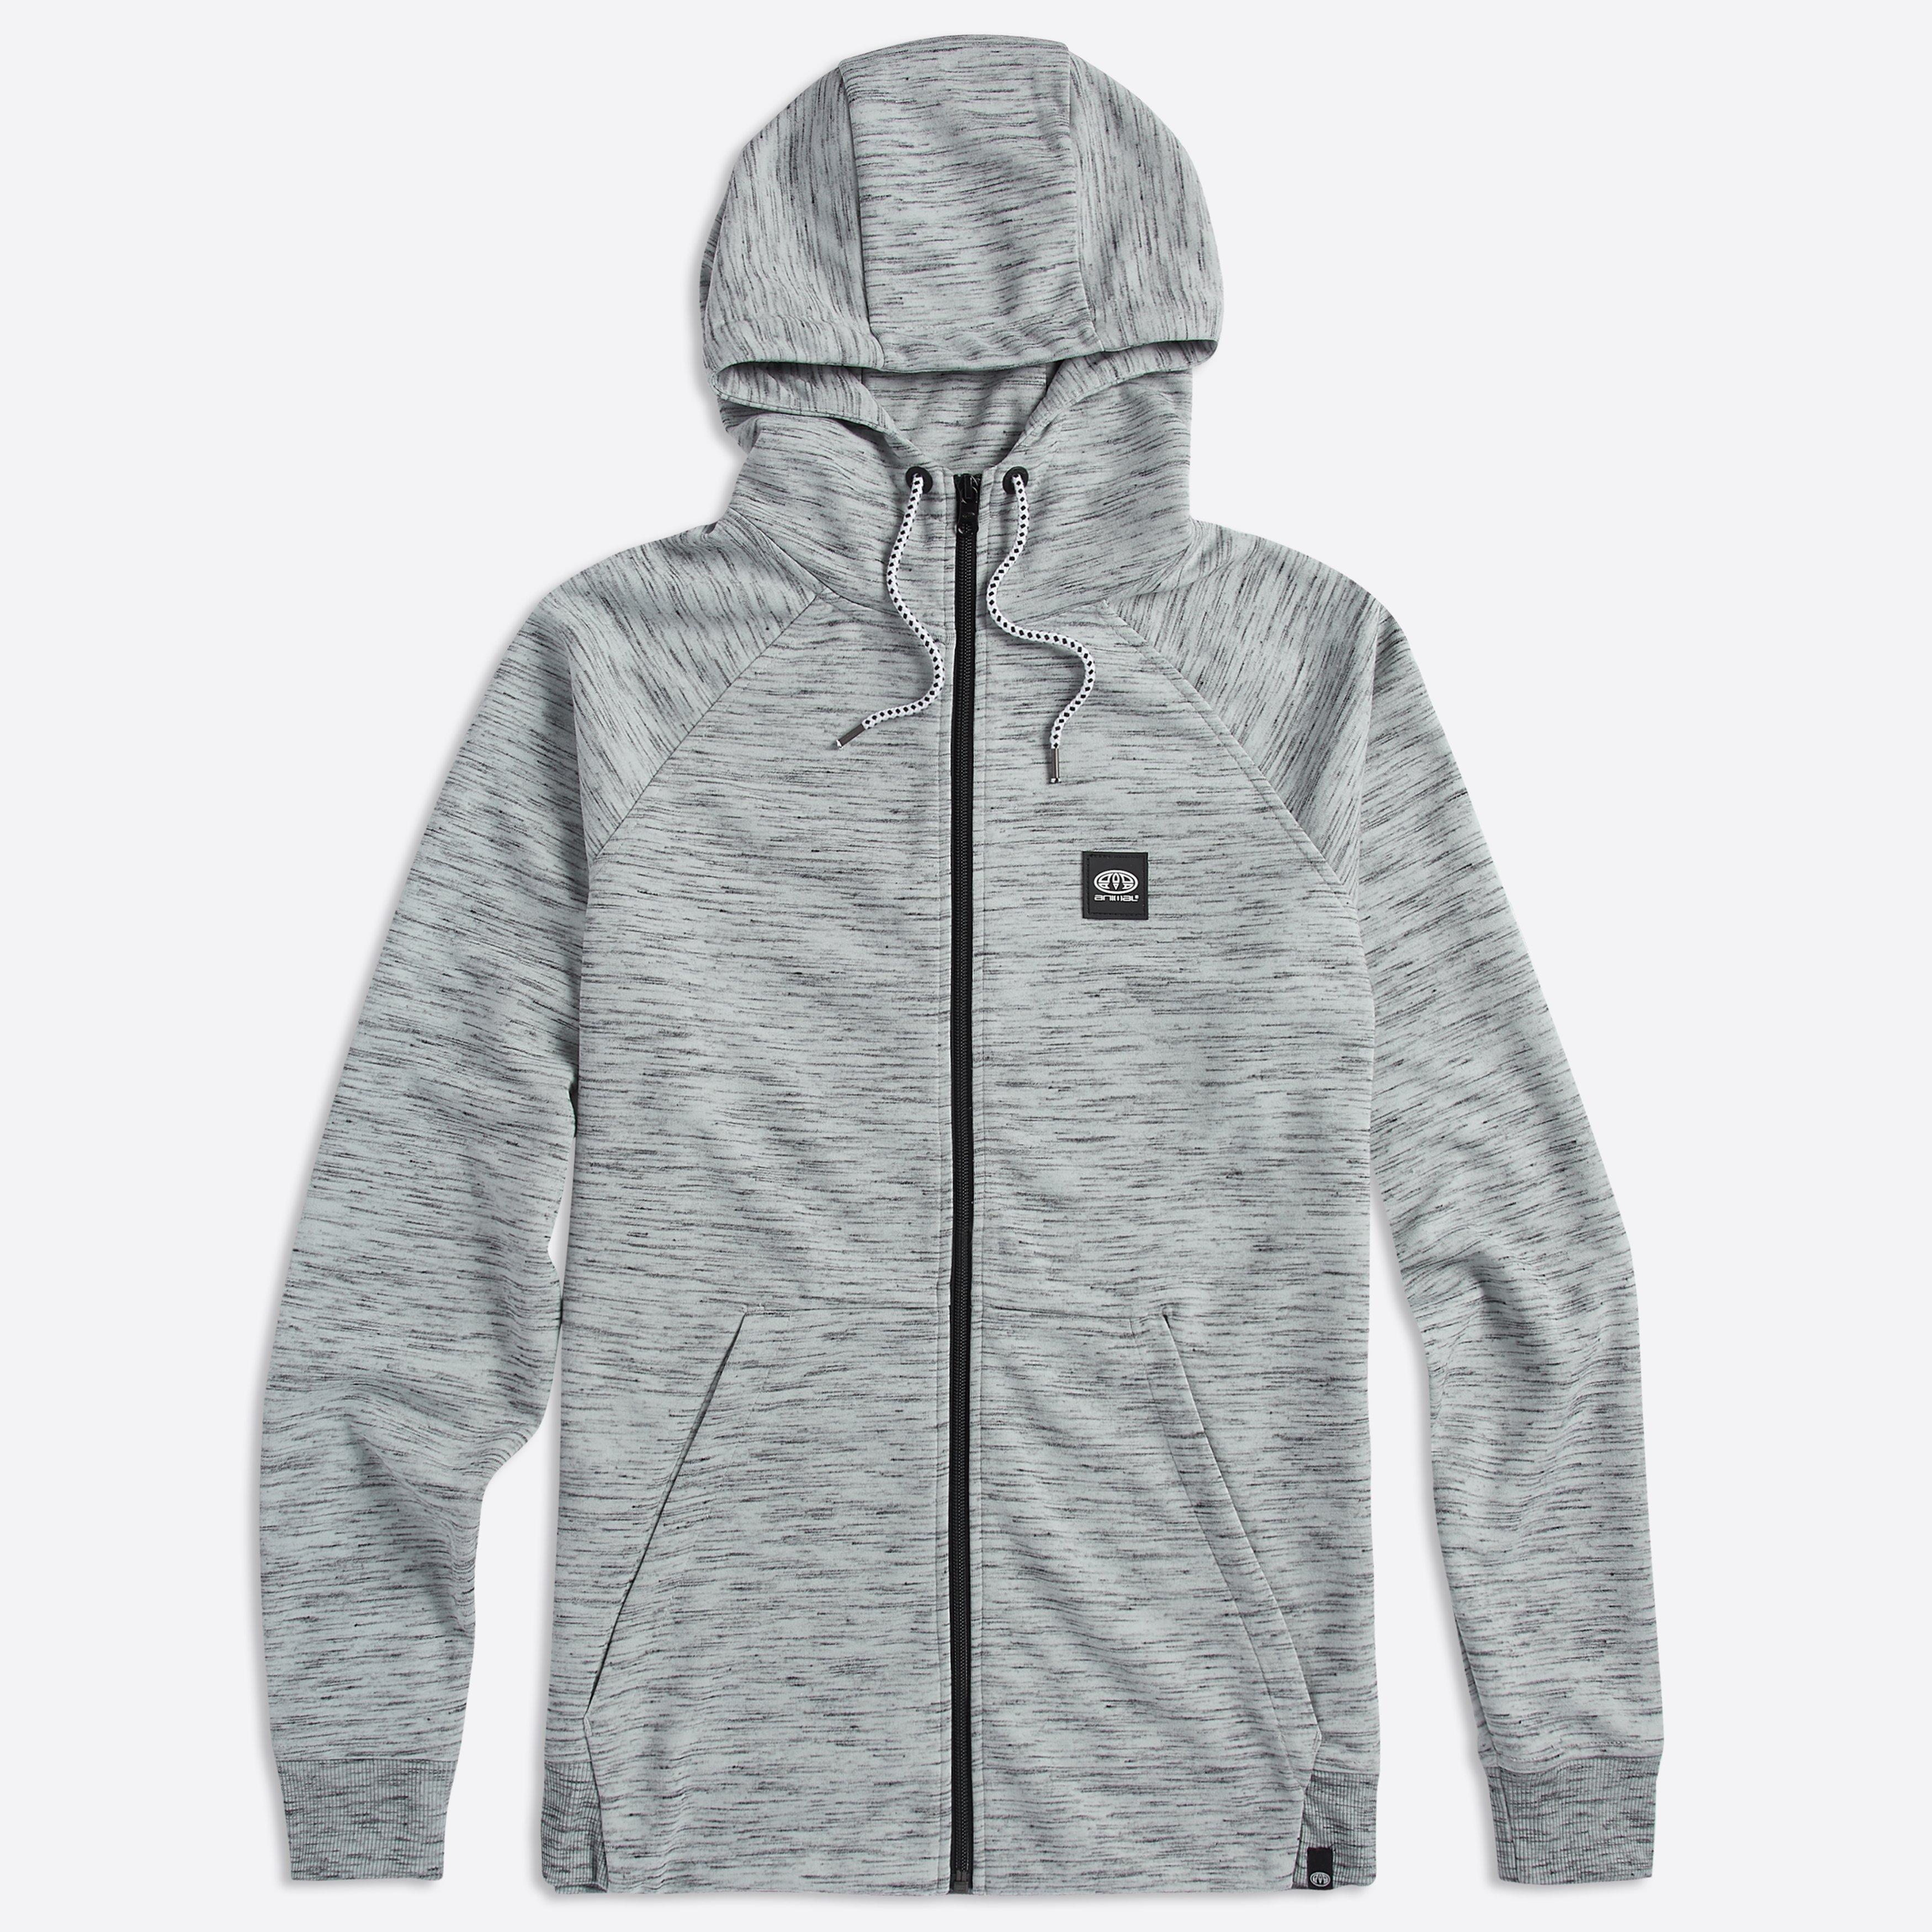 Animal Clothing Men's Venture Zip Jacket Various Colours 5057652285496 - S Grey